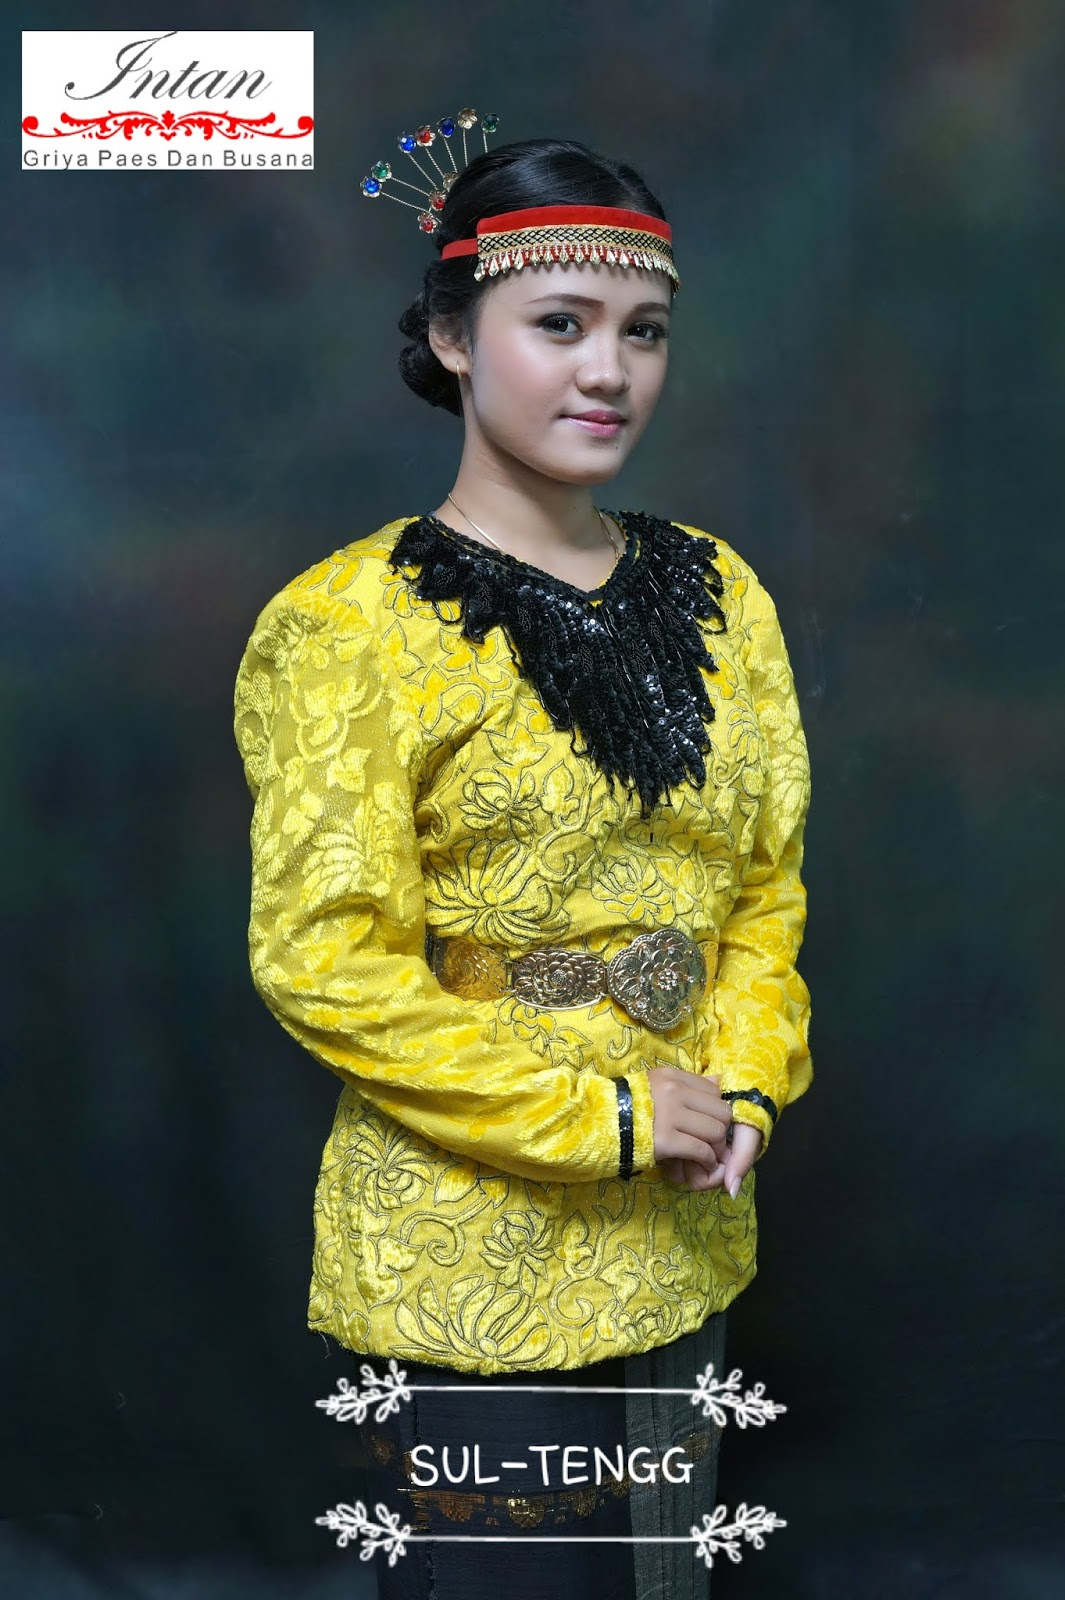 Pakaian Adat Sulawesi Timur